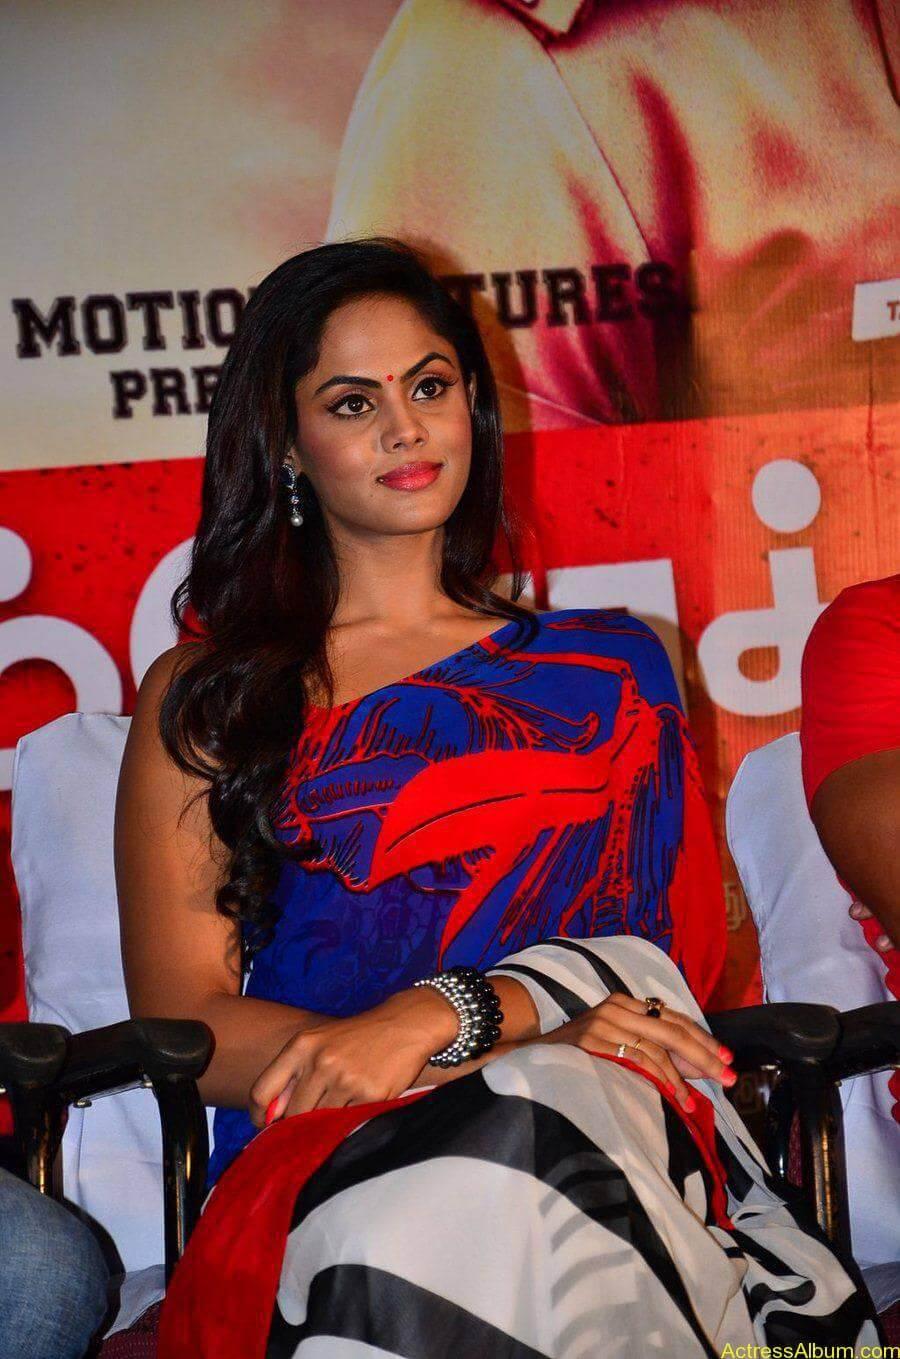 Tamil Actress Karthika Nair Hot in Blue Dress - 1